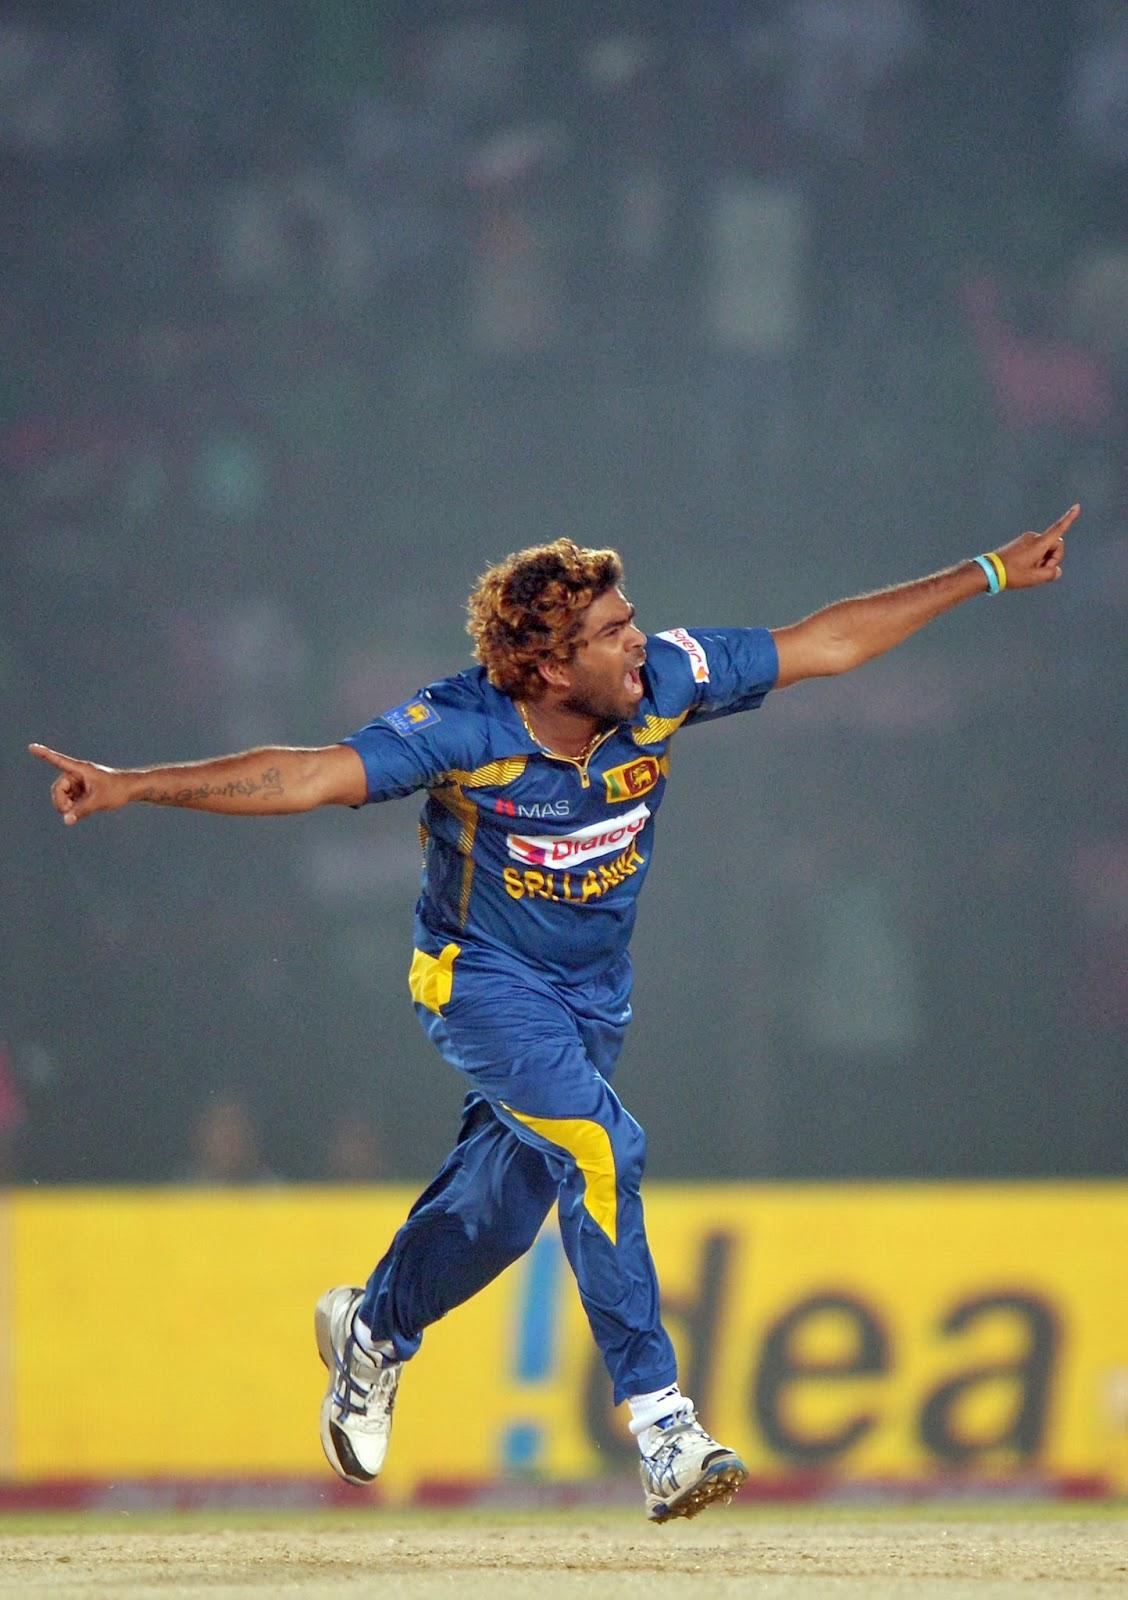 ACC, Asia Cup, Asia Cup 2012, Asia Cup 2014, Bangladesh, Captain, Cricket, First match, Malinga, Mathews, Misbah-ul-Haq, Pakistan, Sports, Sri Lanka, Sri Lanka vs Pakistan, Team, Tournament, Umer Gul, Winner,